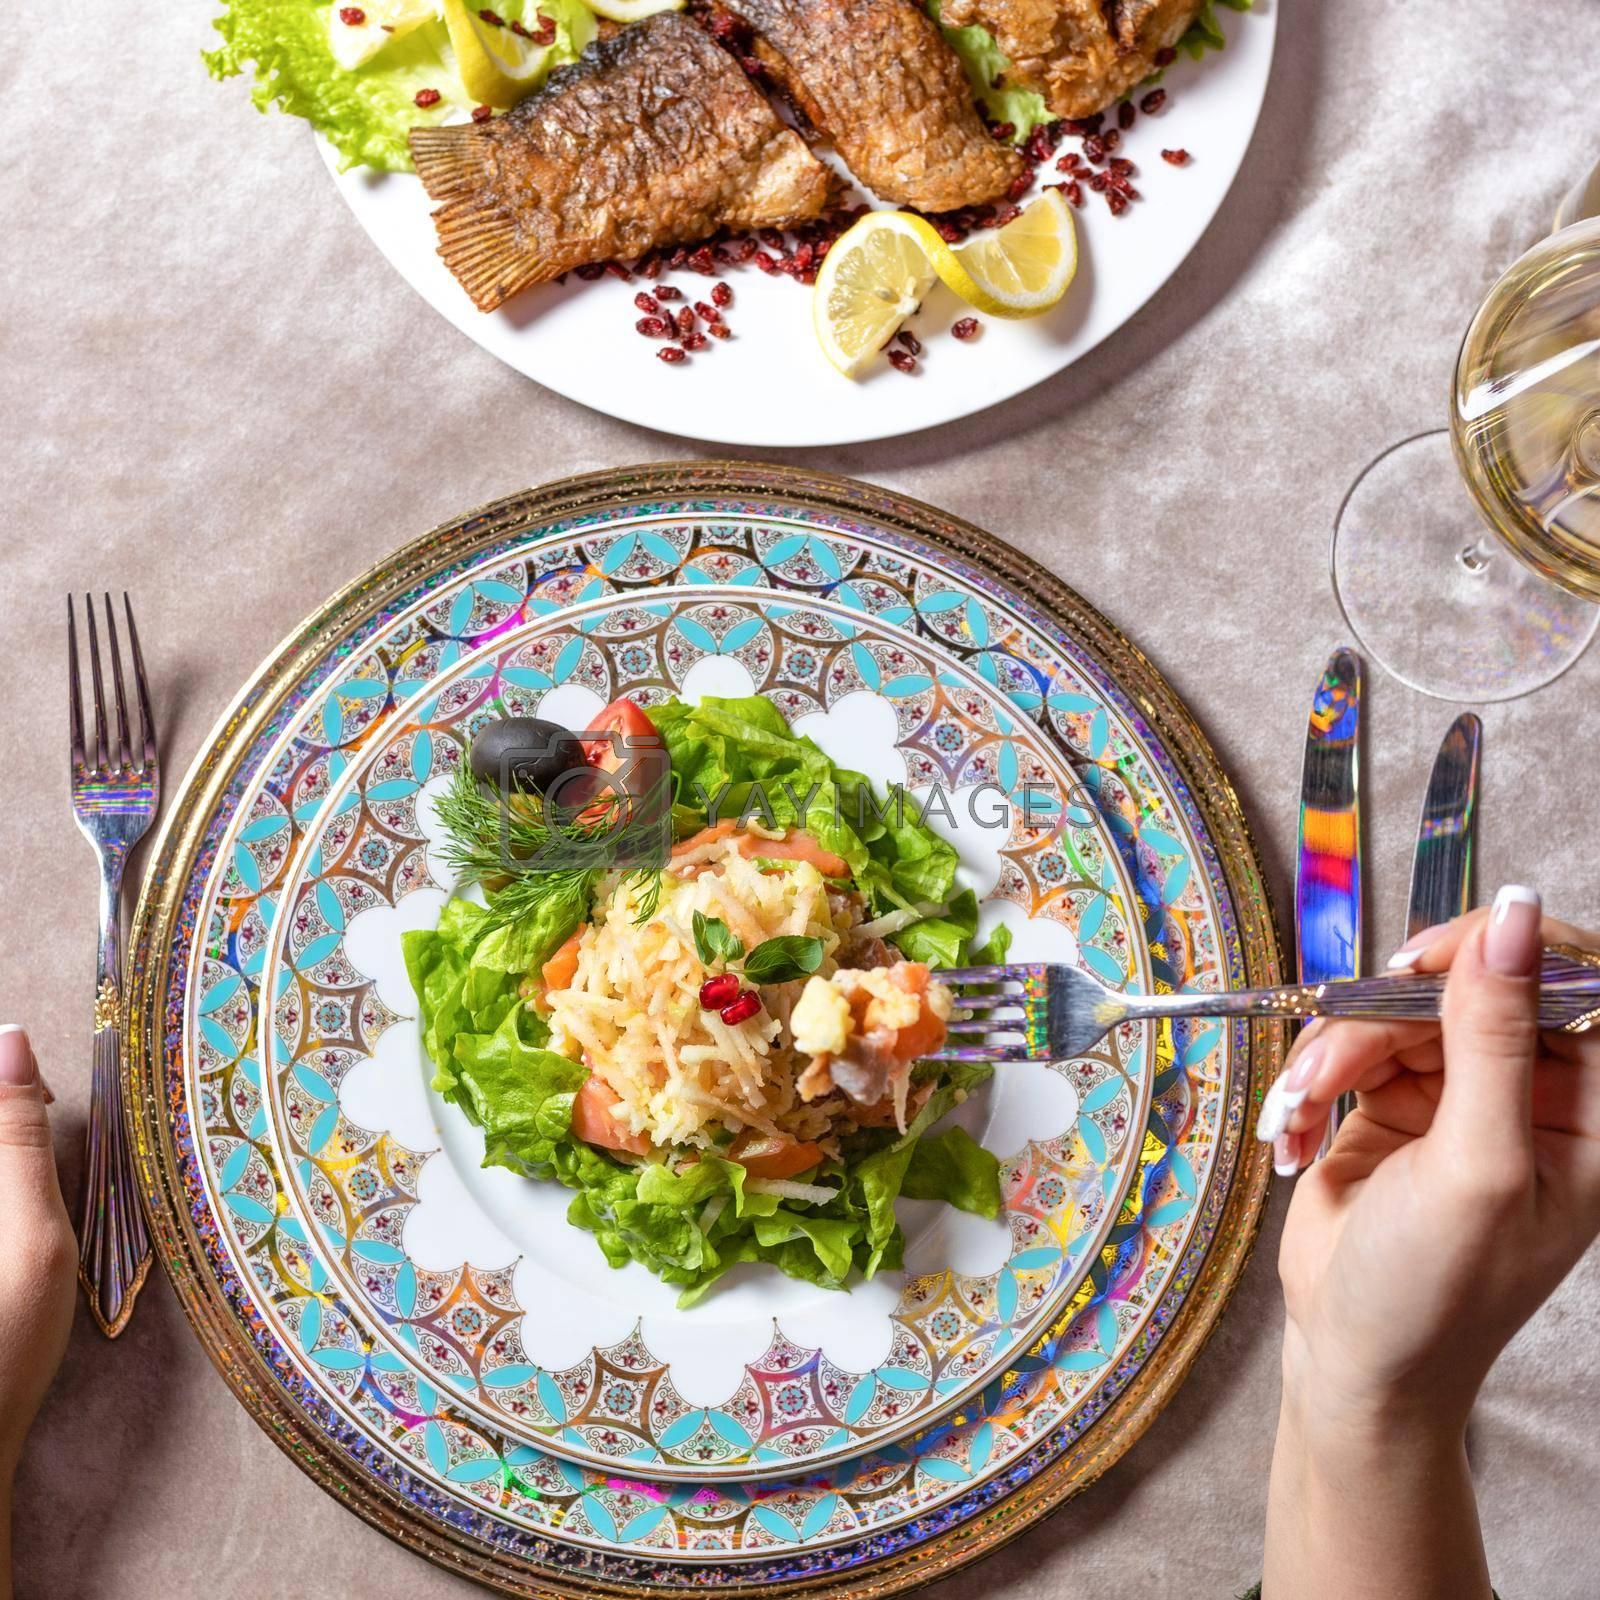 Woman eating a fish salad top view